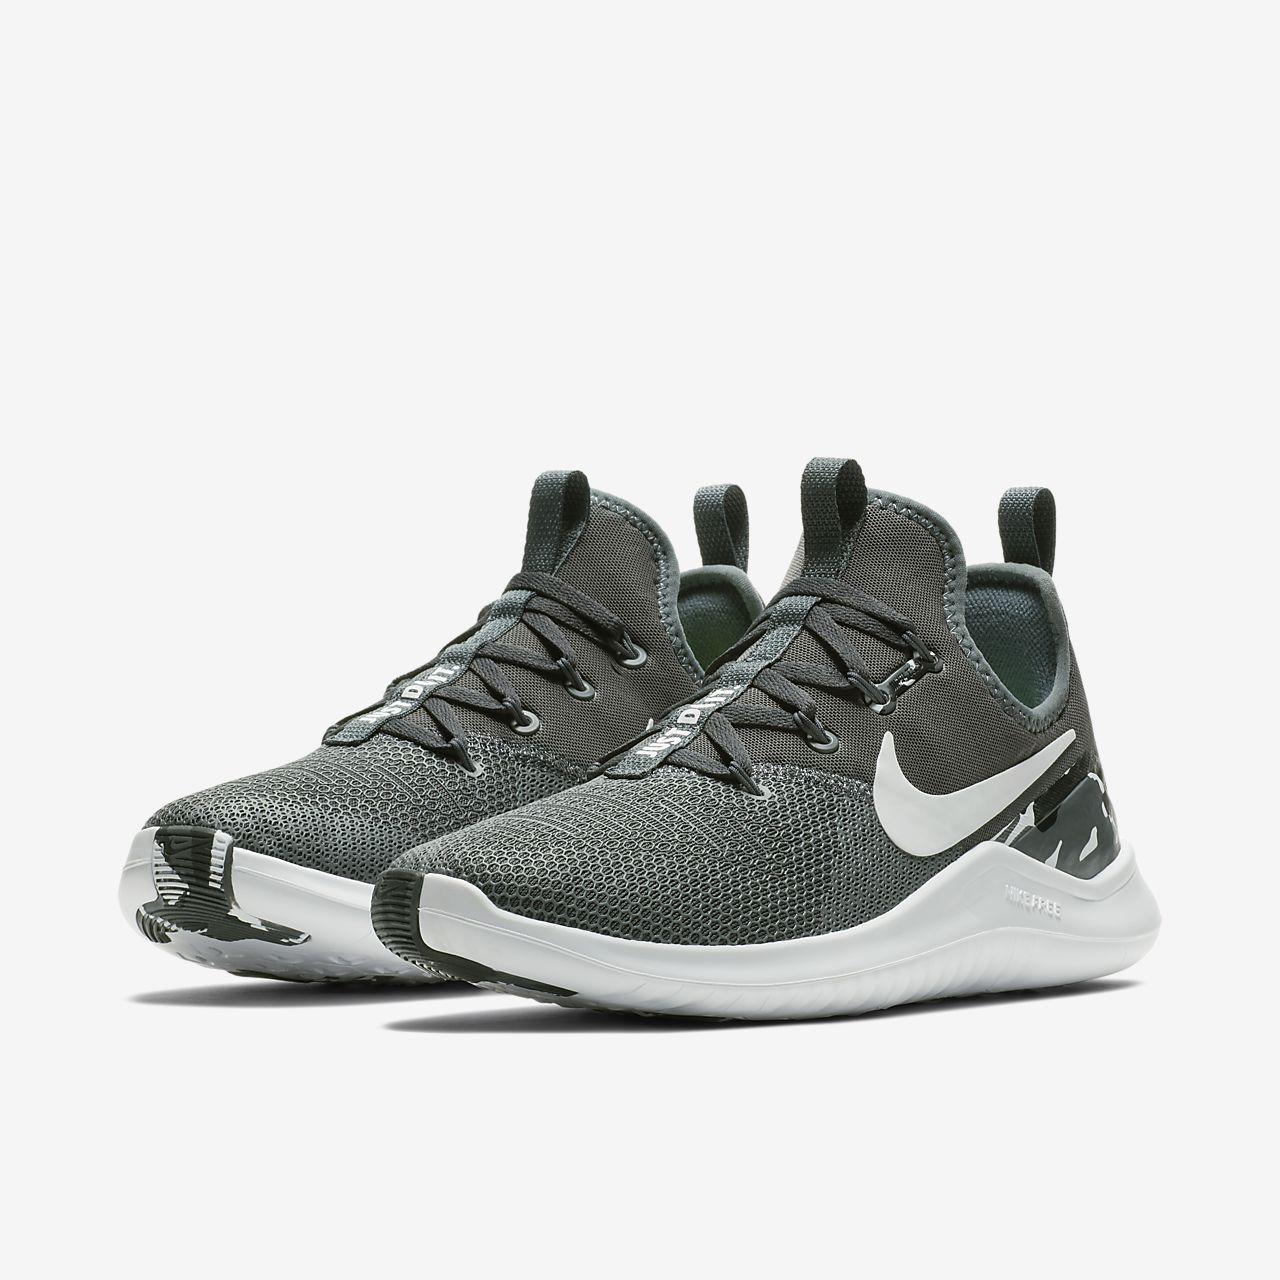 ... Nike Free TR 8 AMP Women's Training Shoe